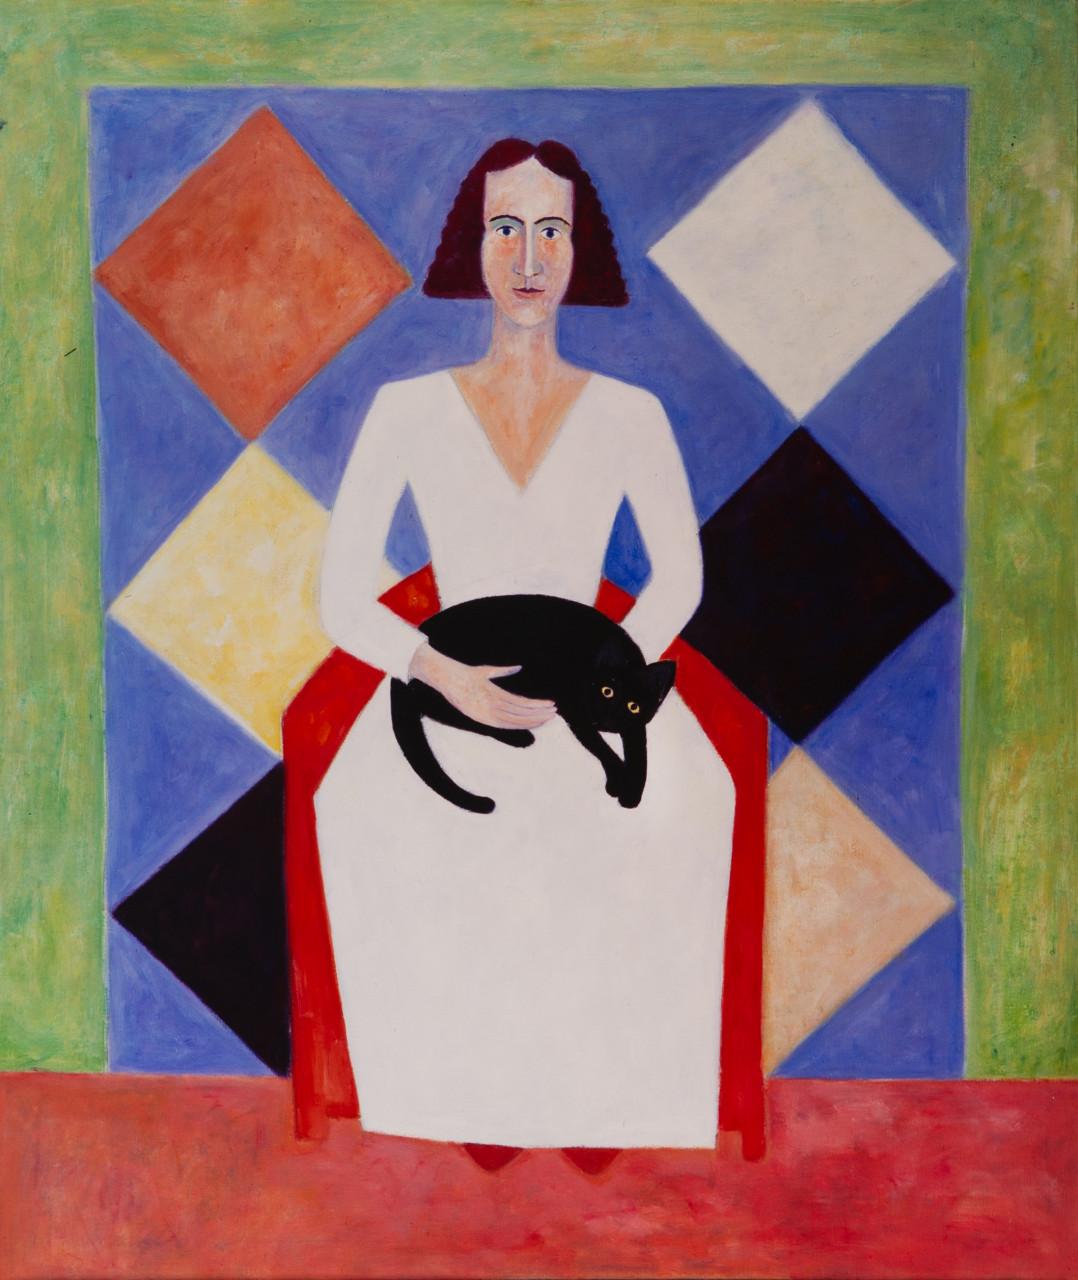 Monika mit Katze 1988 Öl auf Leinwand 100x135cm